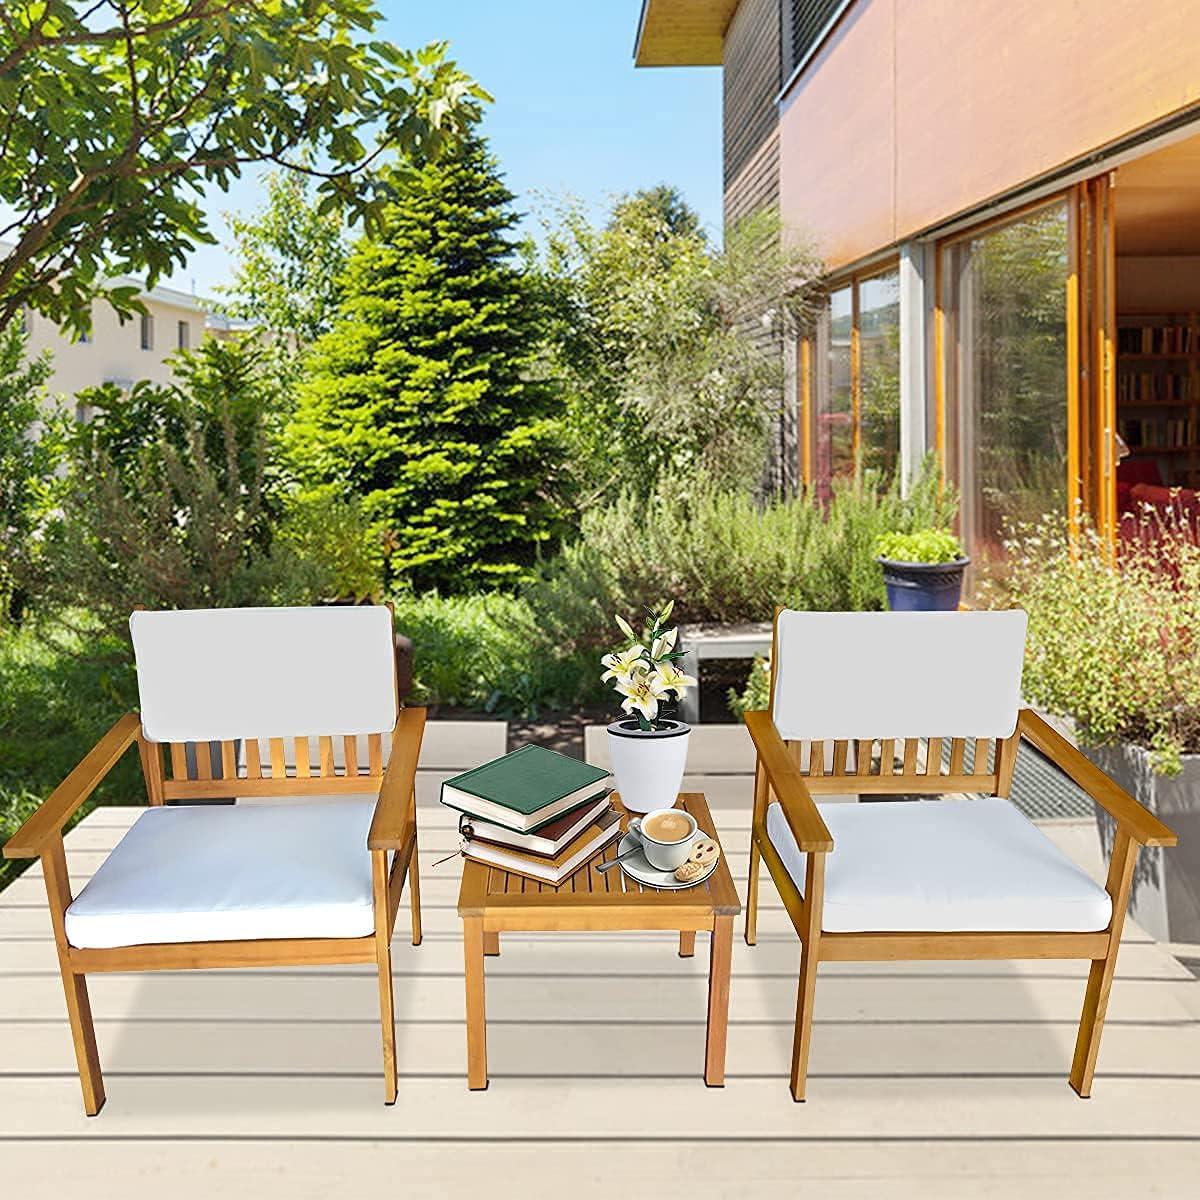 3 Pieces Patio Nippon regular agency Set Direct stock discount Wood Outdoor Acacia Furniture